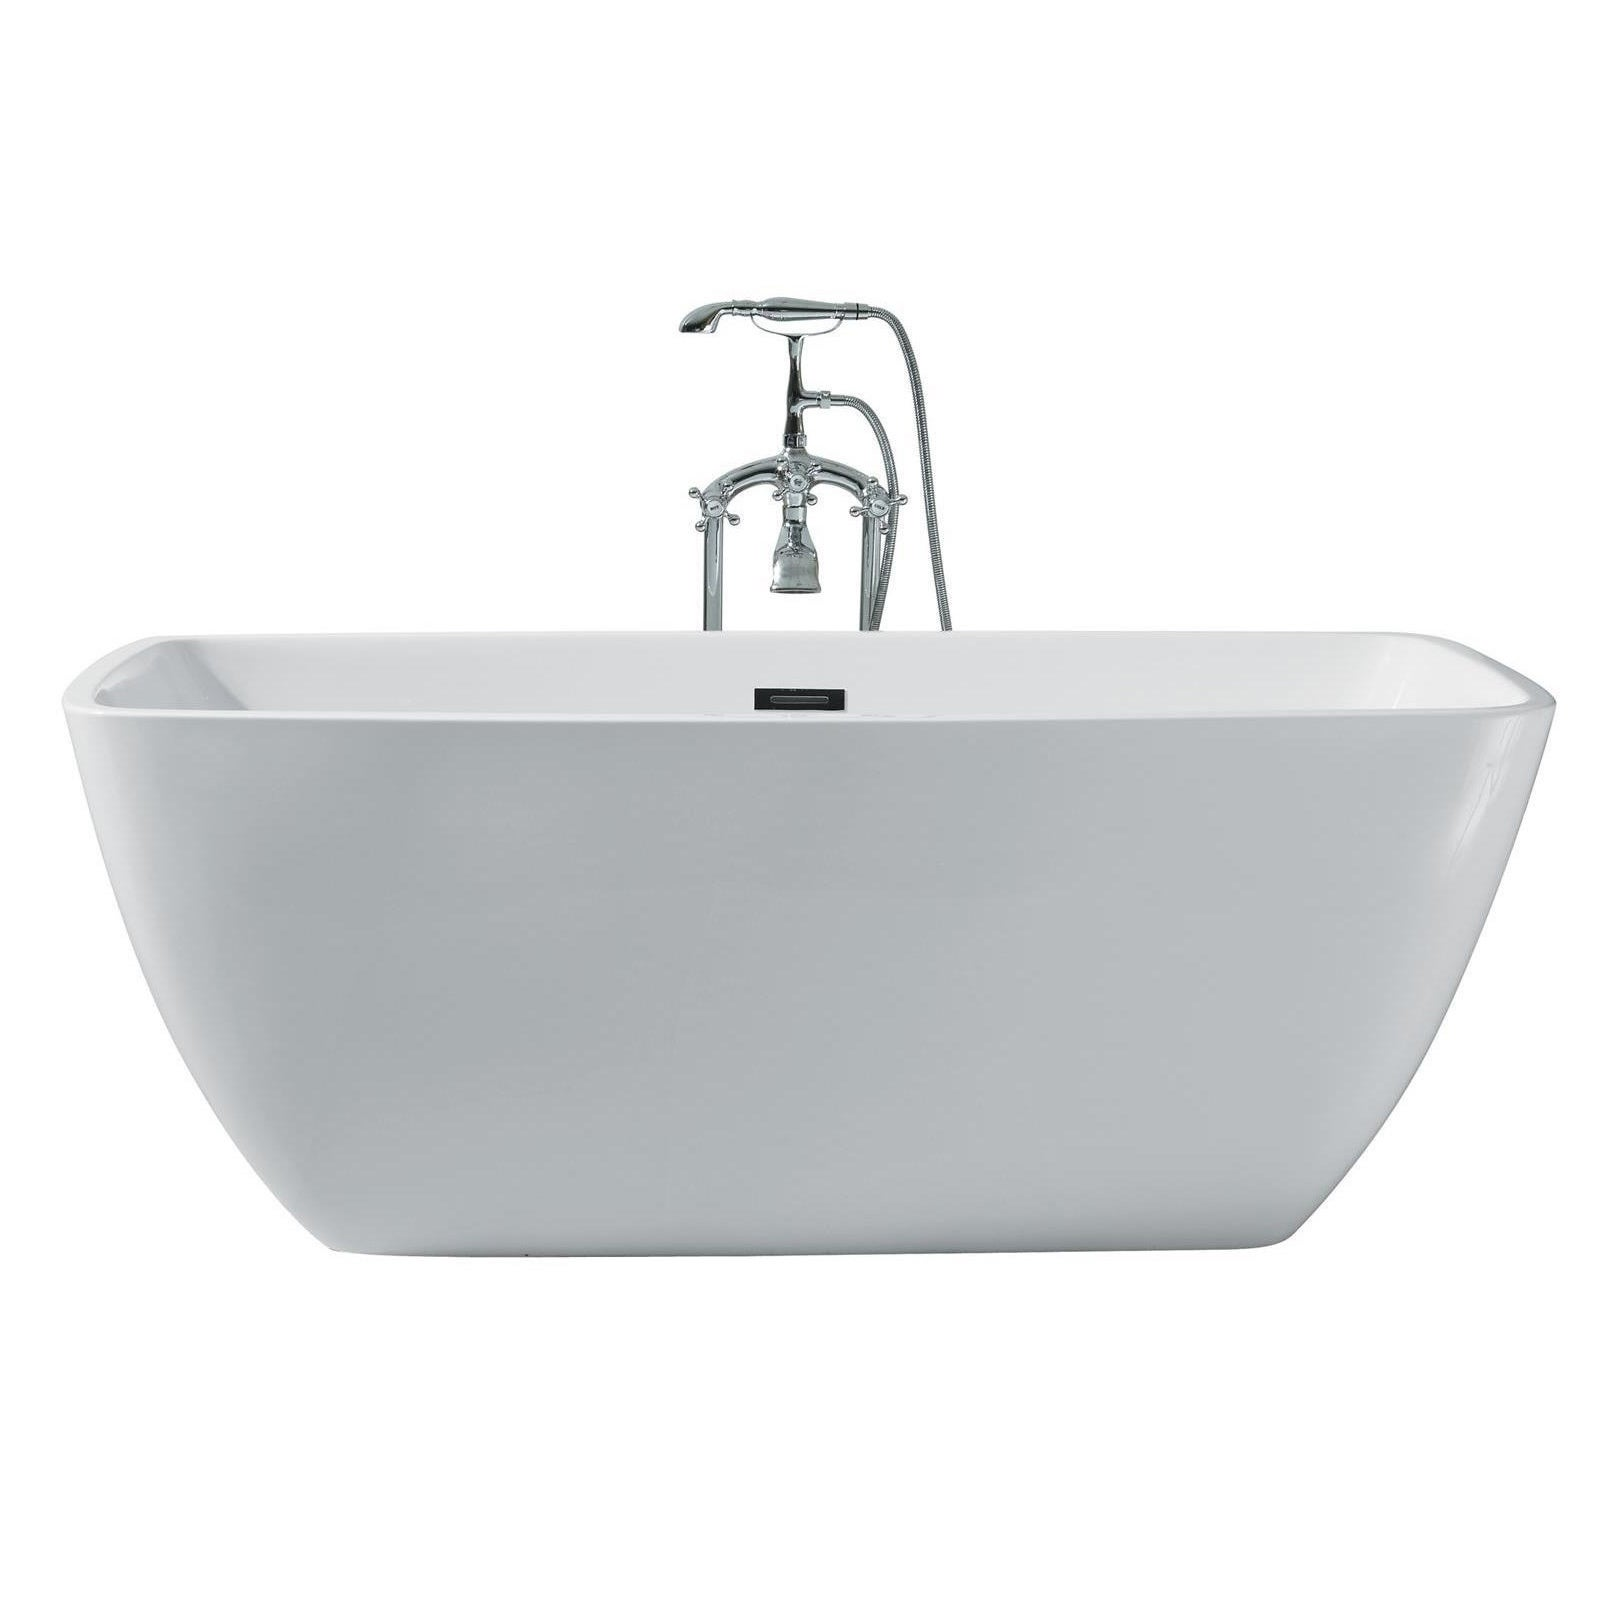 Shop Ariel Platinum Aurora White Acrylic 63-inch Rectangular Bathtub ...